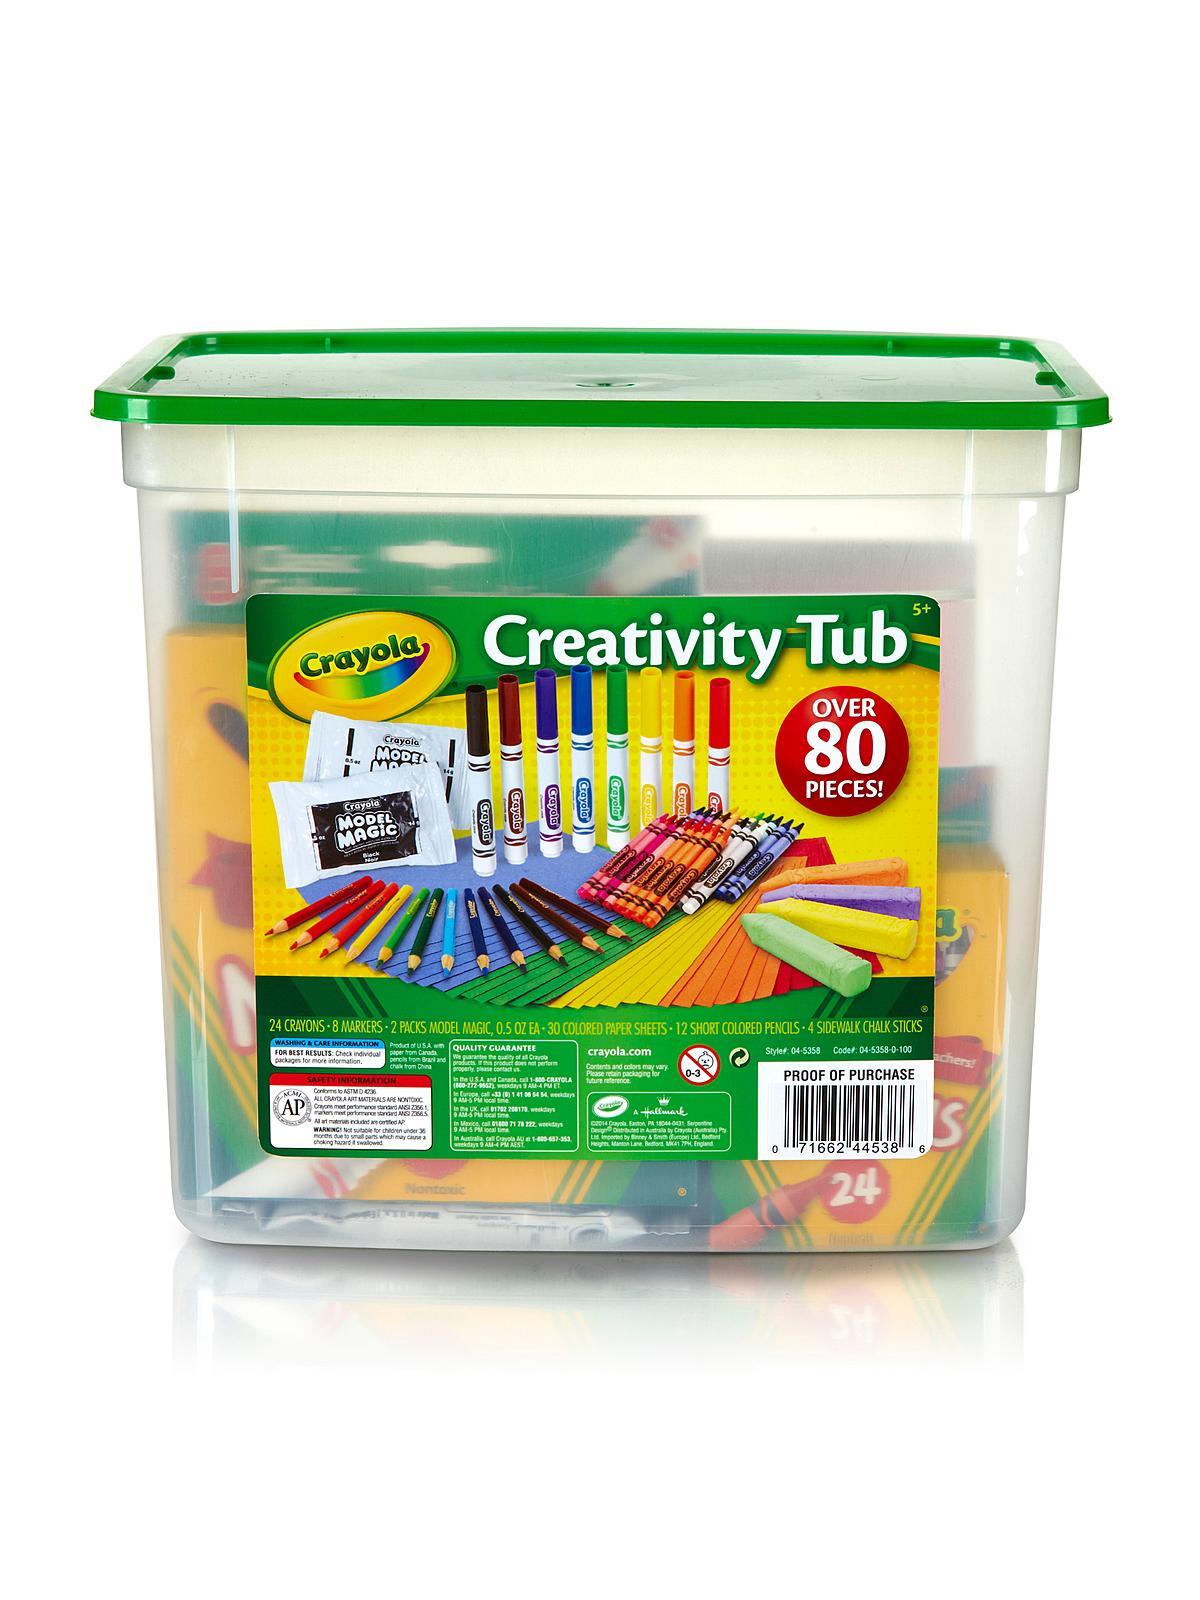 Creativity Tub